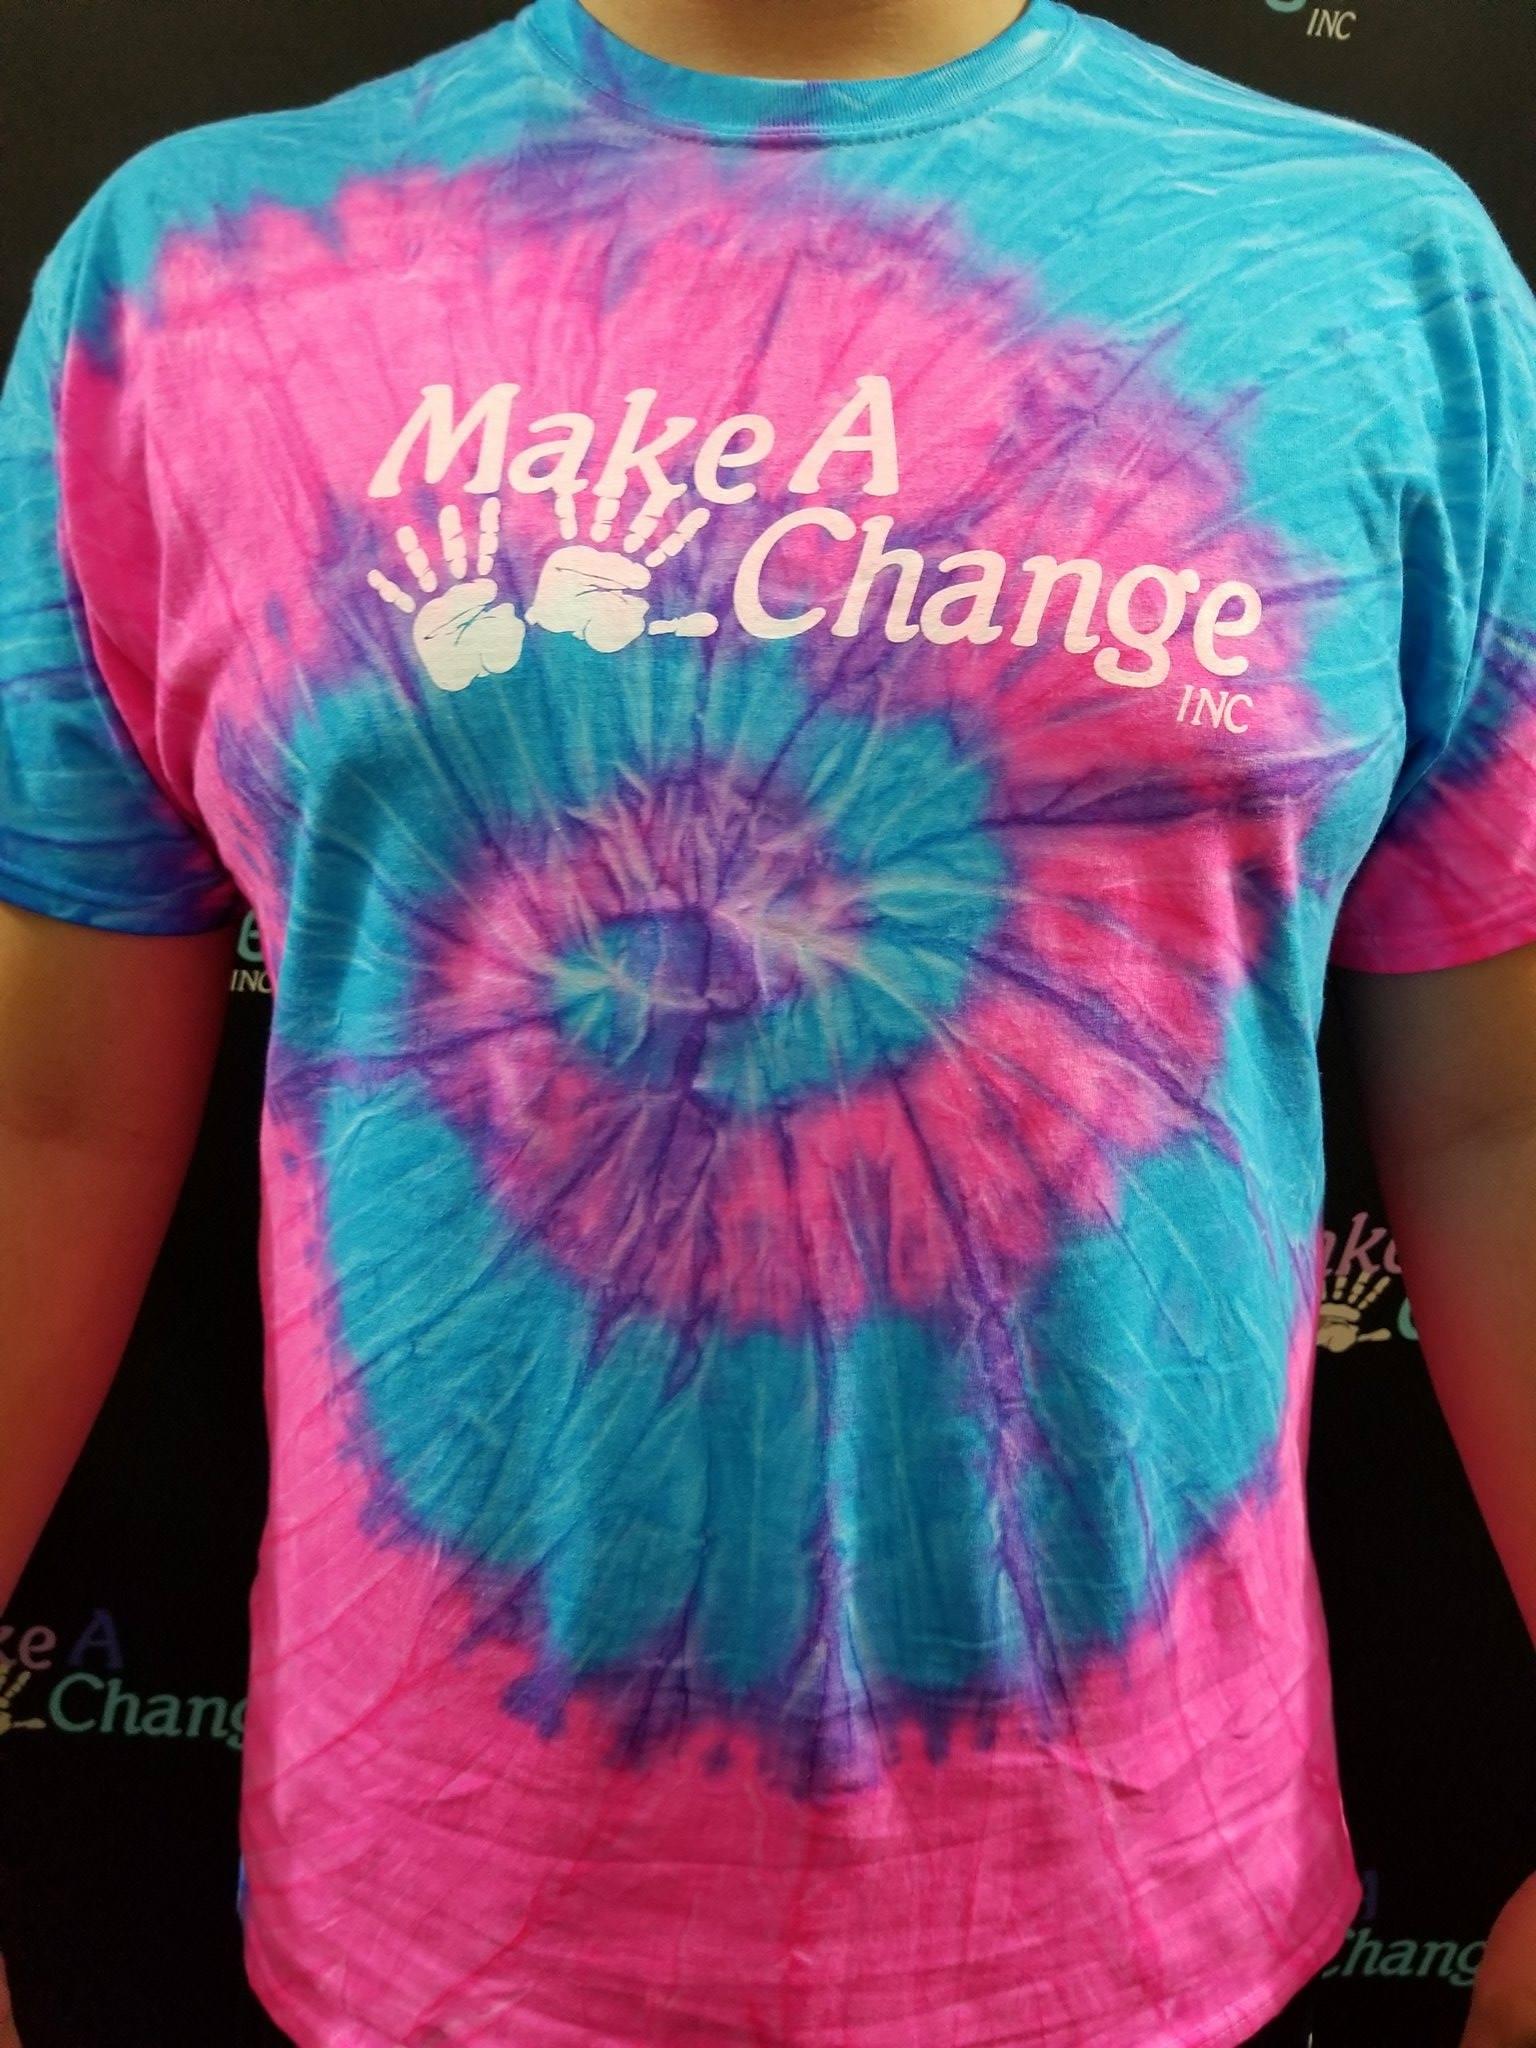 Make-A-Change Inc. Shirts